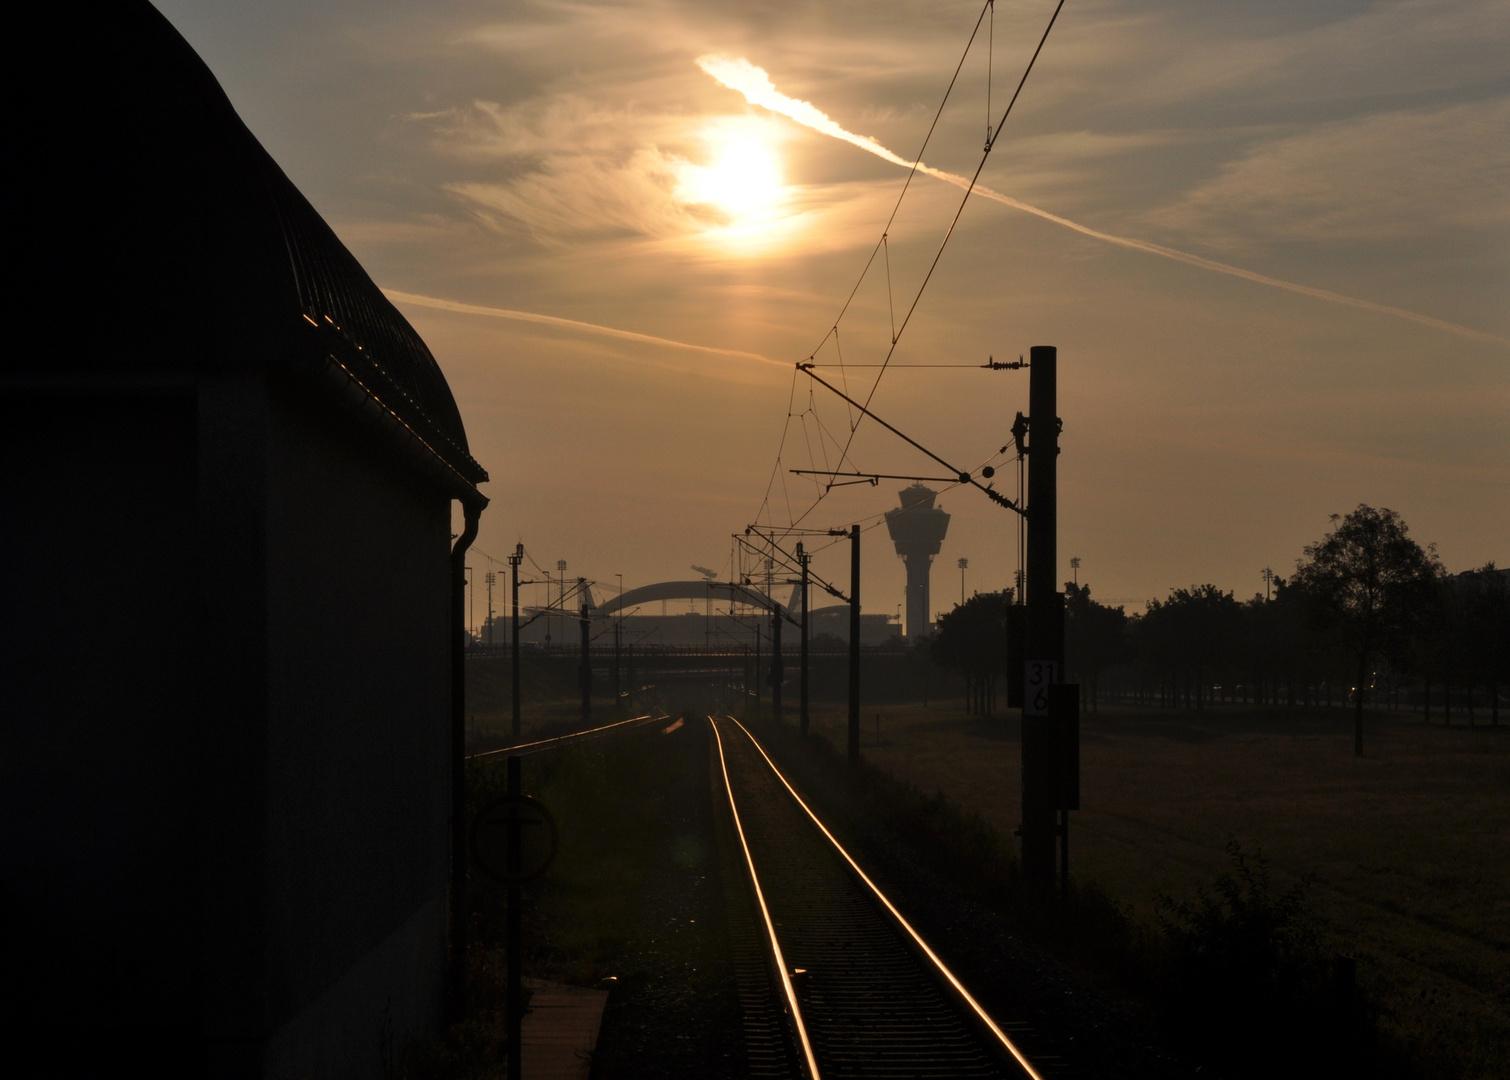 Richtung Sonnenaufgang